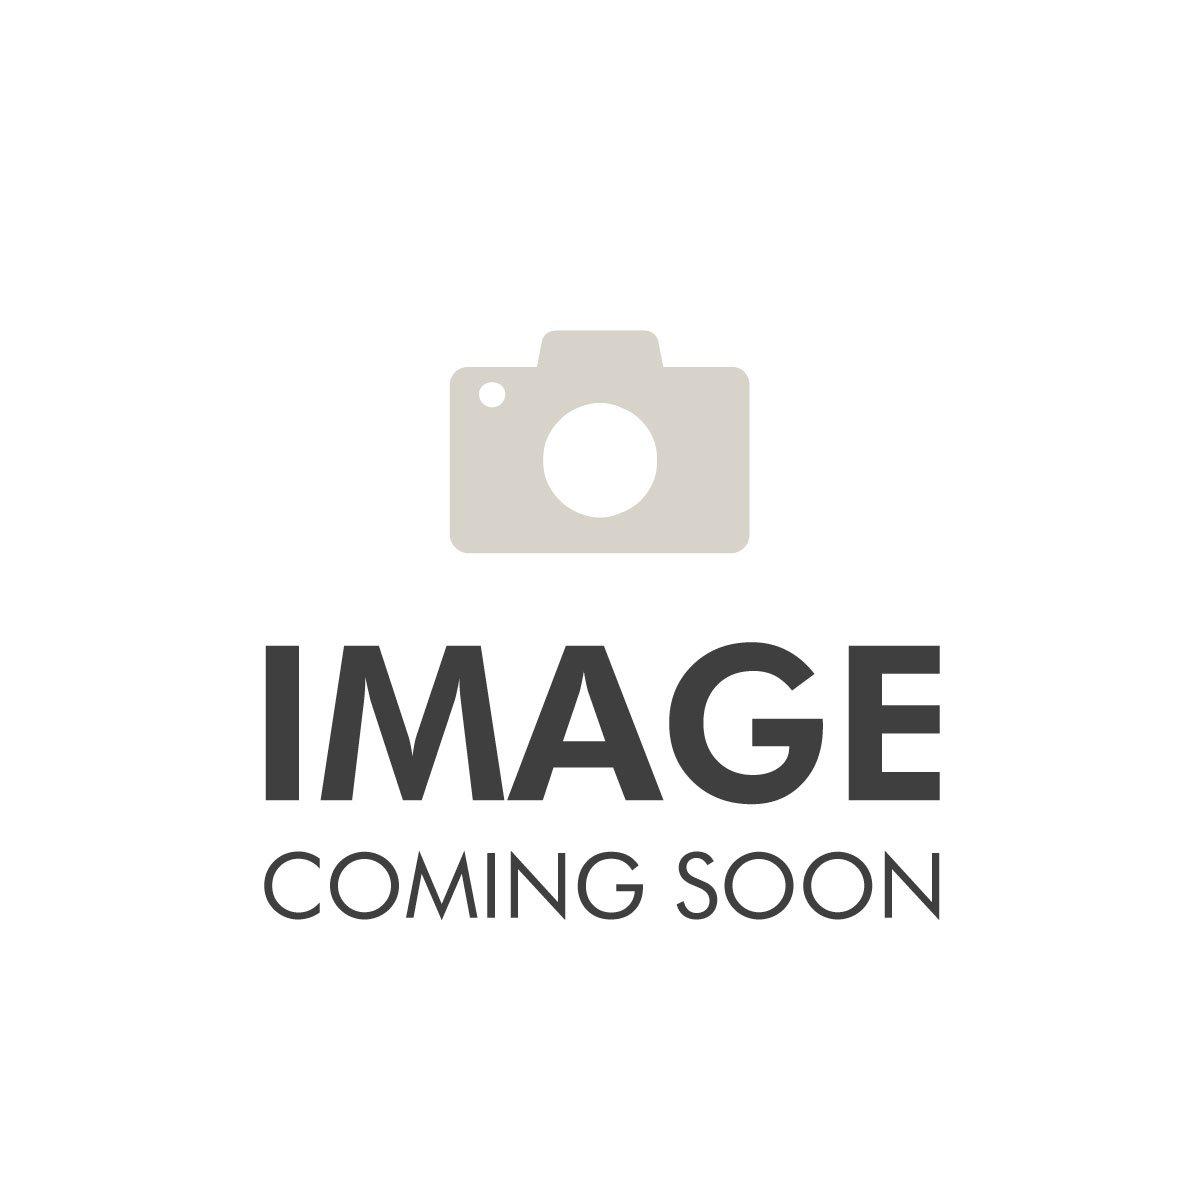 L'Oreal Loreal Permanent Hair Color Prodigy 3 Khol